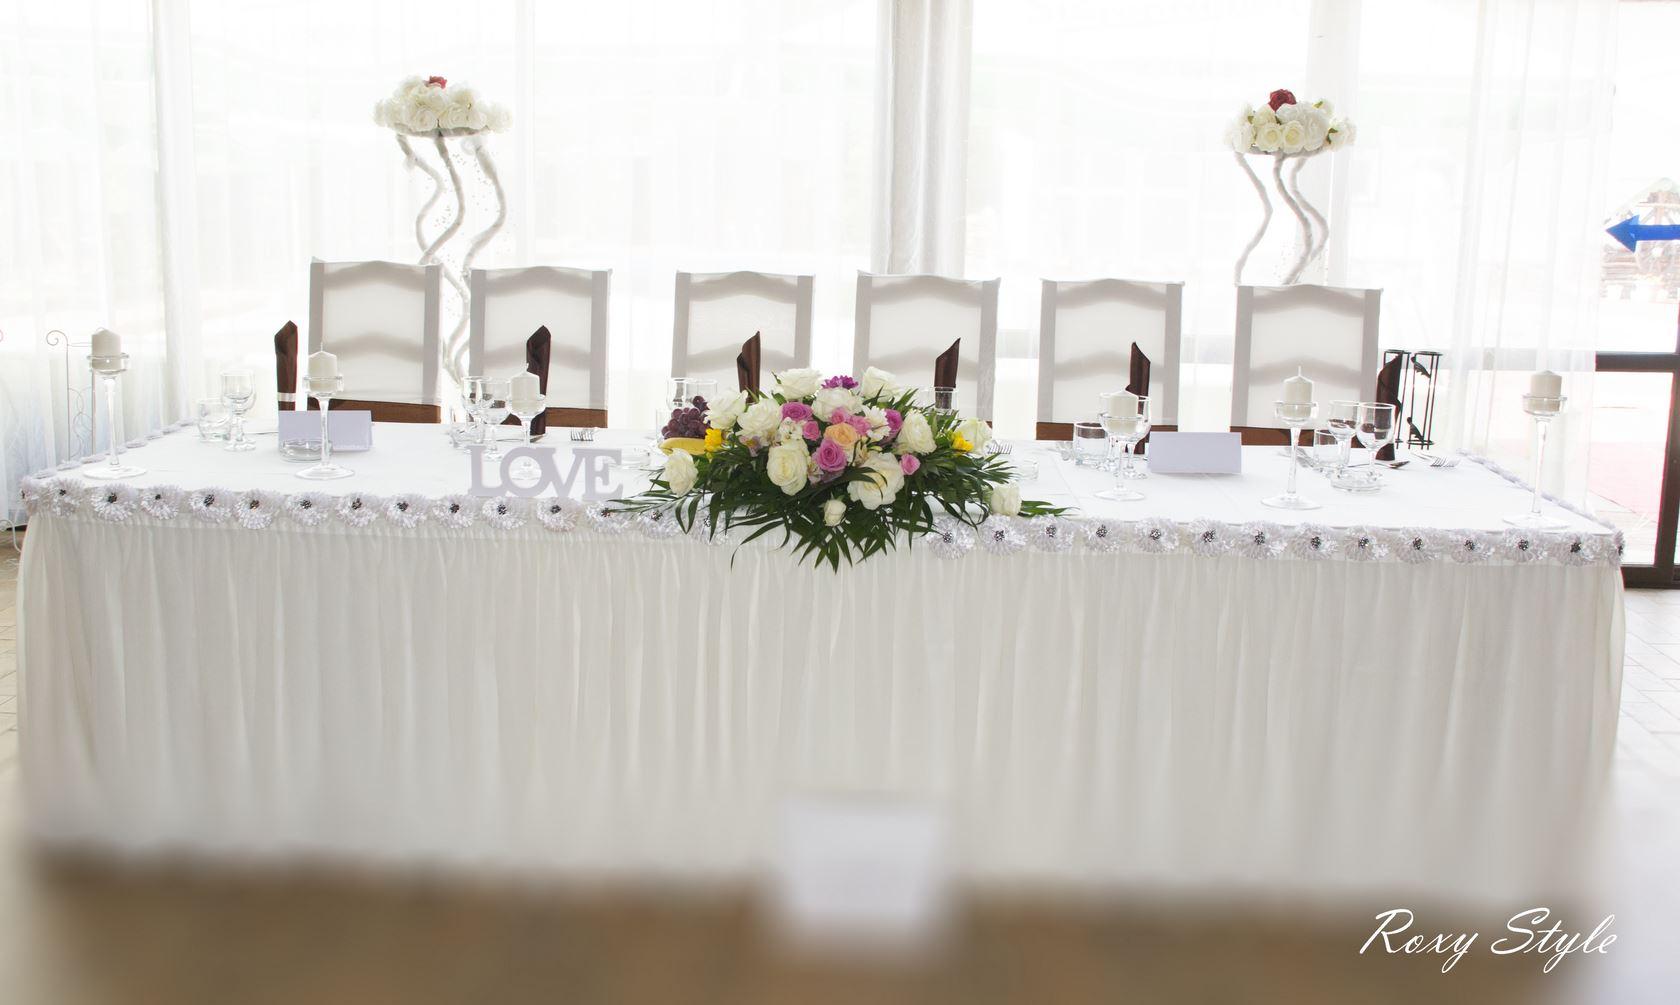 Amejanari Nunta Moreni Amenajari Si Decoratiuni Sali Pentru Nunti